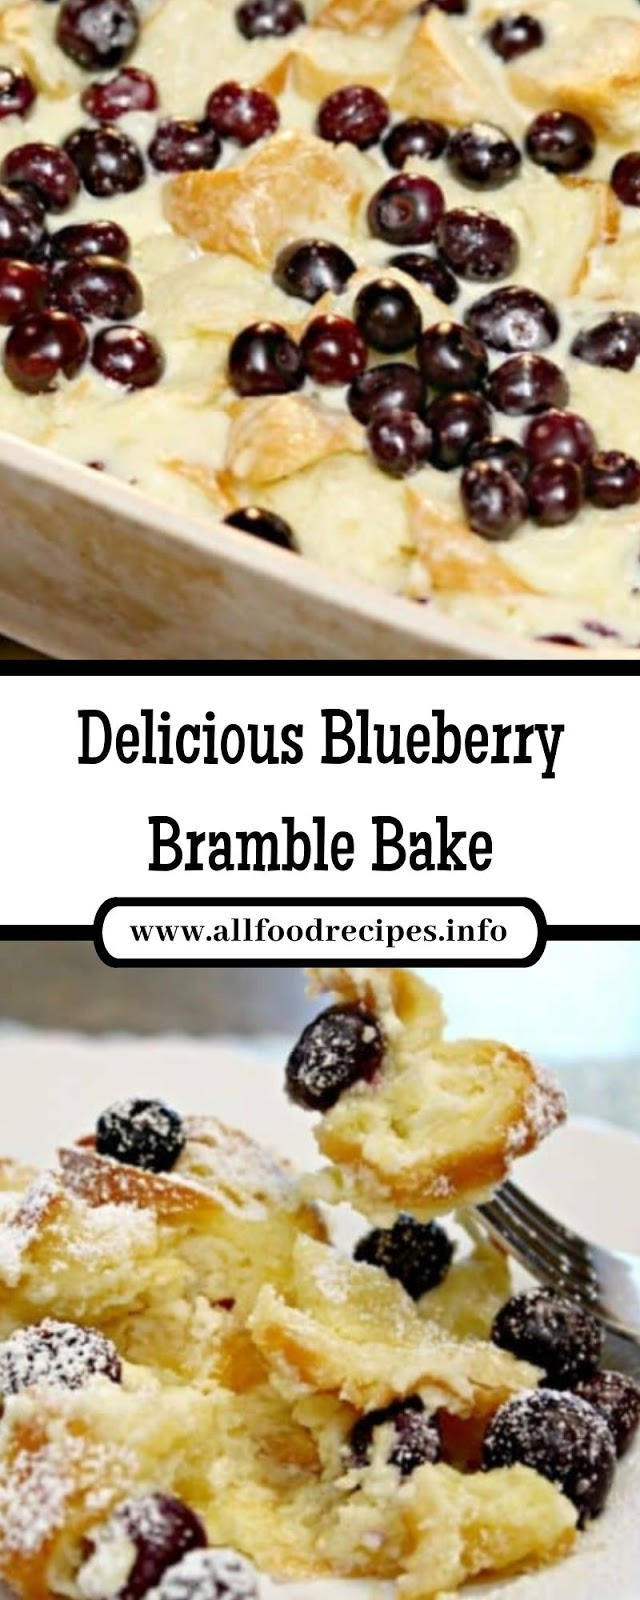 Delicious Blueberry Bramble Bake